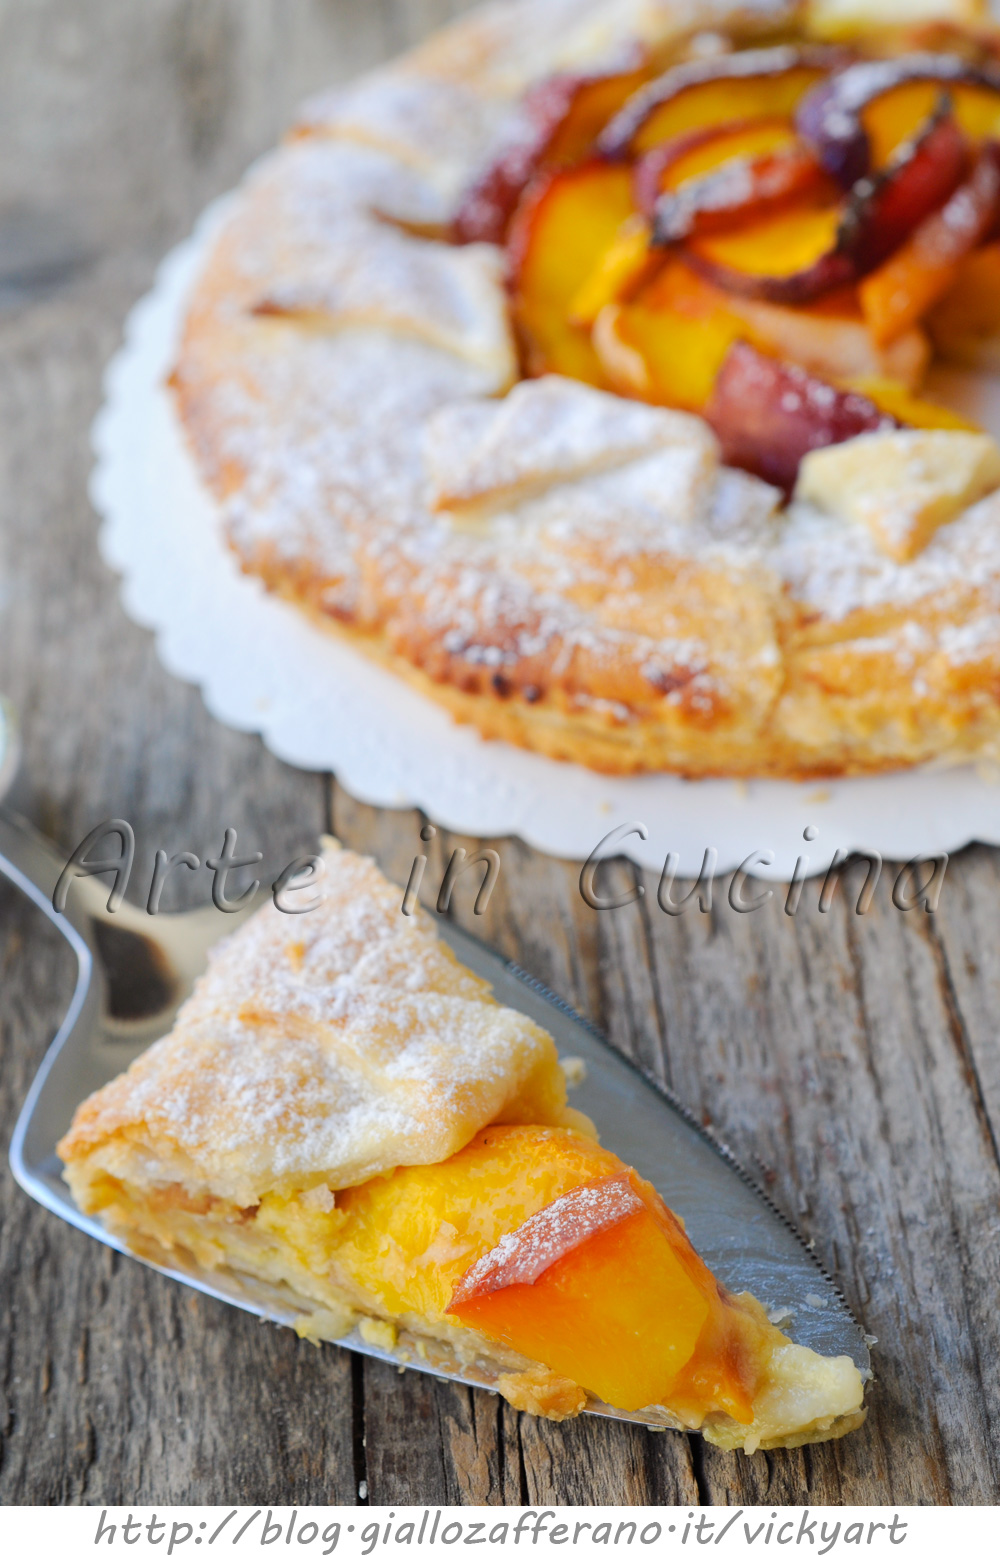 Torta sfogliata alla crema e pesche ricetta dolce arte in cucina - Cucina macrobiotica dolci ...